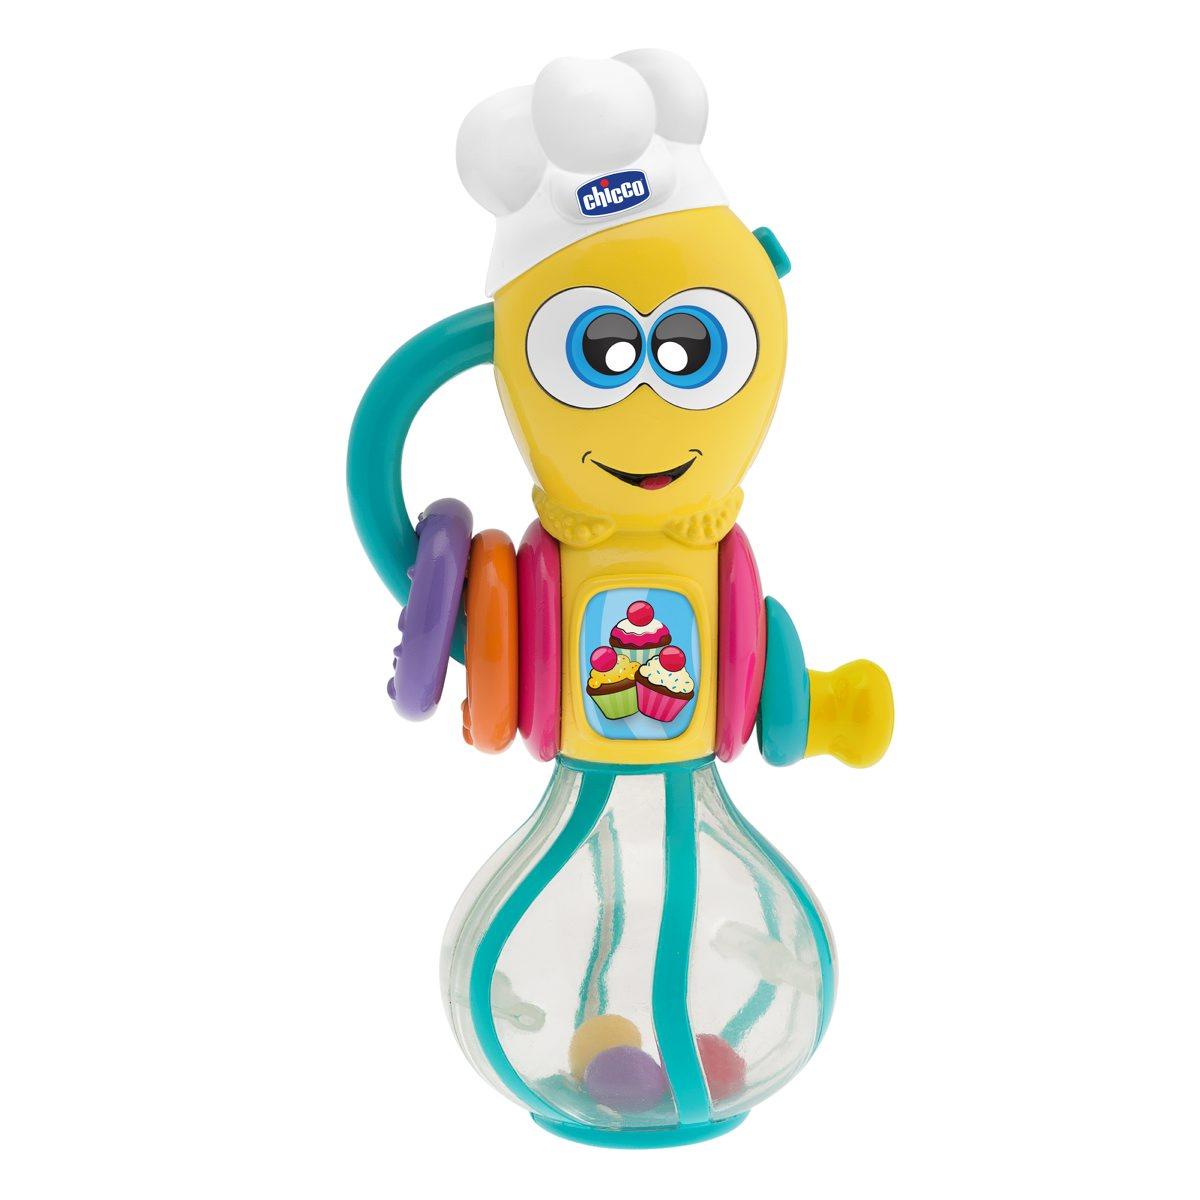 Chicco Музыкальная игрушка Мутовка lilliputiens курочка офелия музыкальная игрушка